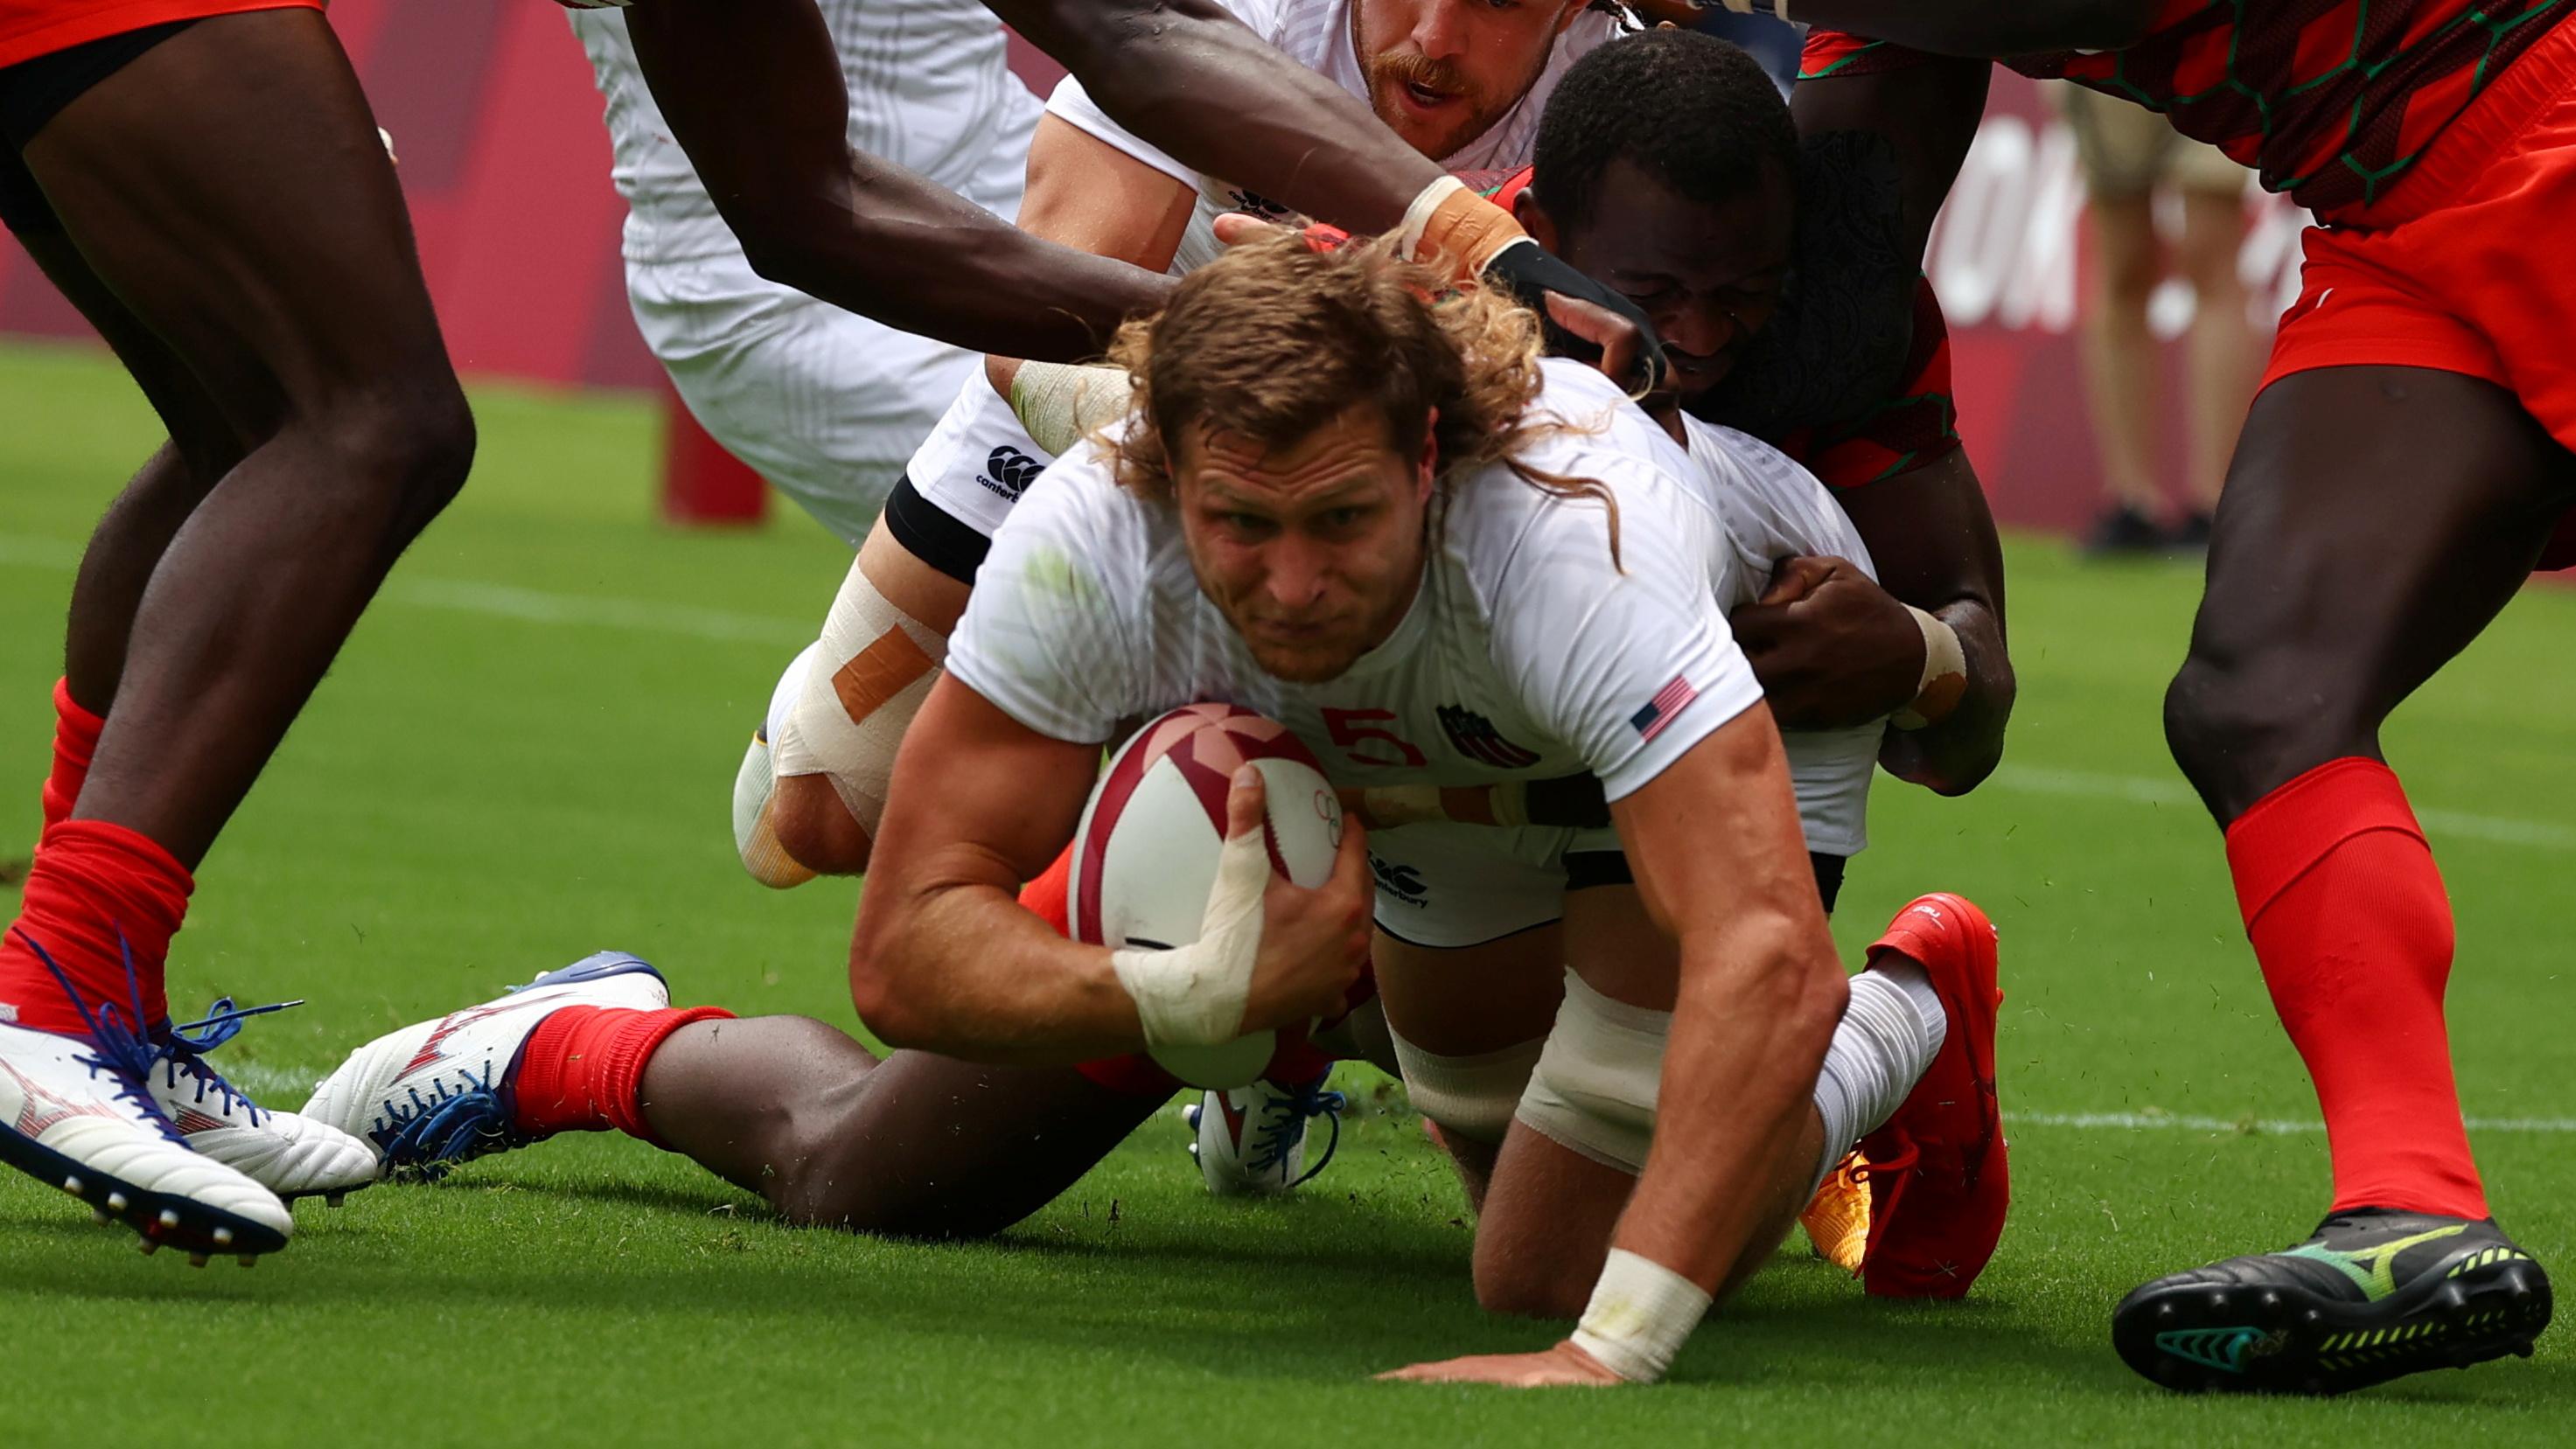 Tokyo 2020 Olympics - Rugby Sevens - Men - Pool C - United States v Kenya - Tokyo Stadium - Tokyo, Japan - July 26, 2021. Joe Schroeder of the United States in action. REUTERS/Siphiwe Sibeko - SP1EH7Q07TH05